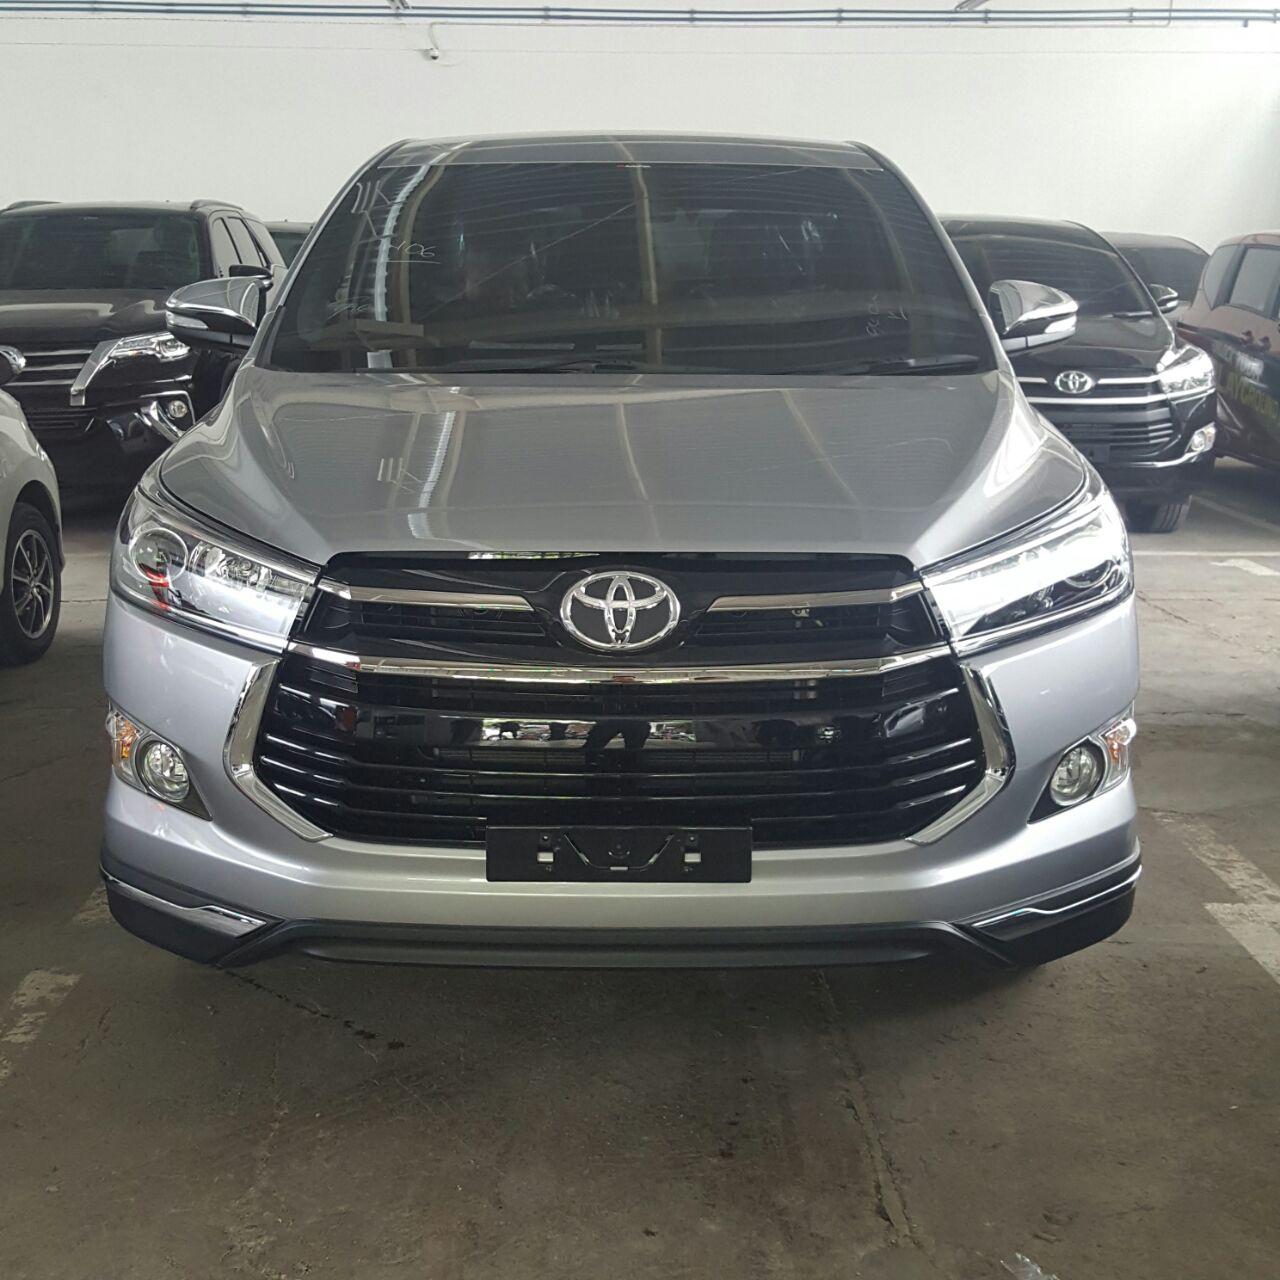 Perbedaan New Innova Dan Venturer Pajak All Kijang 2016 Harga 2017 Cicilan Murah Toyota Jakarta